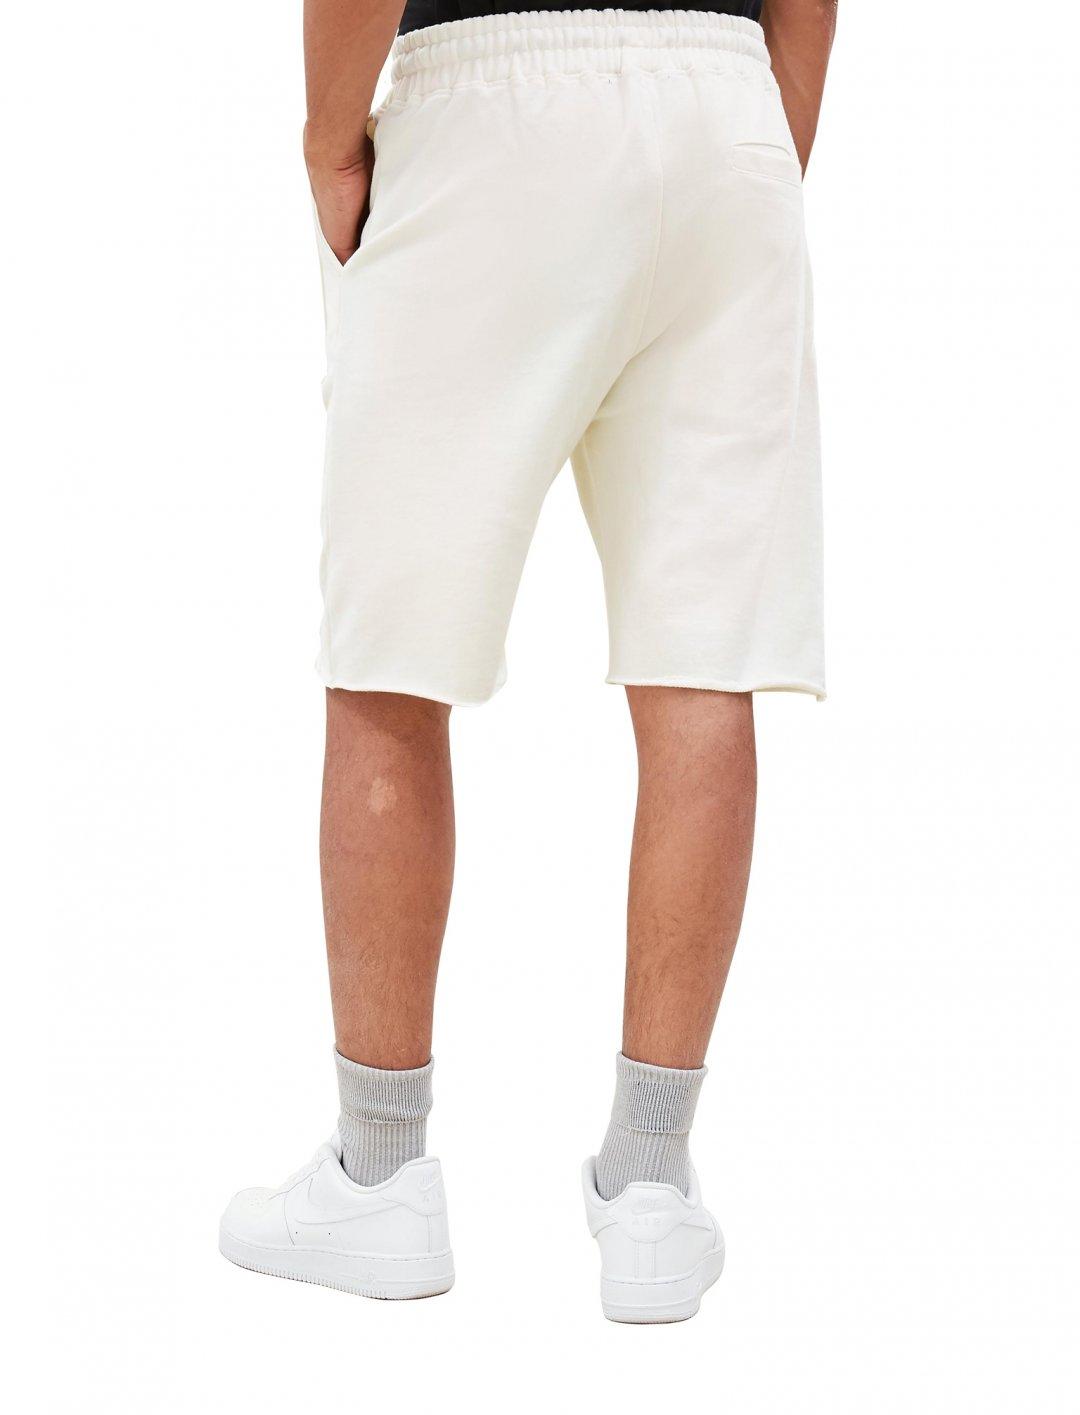 "Not3s' White Shorts {""id"":5,""product_section_id"":1,""name"":""Clothing"",""order"":5} Mennace"